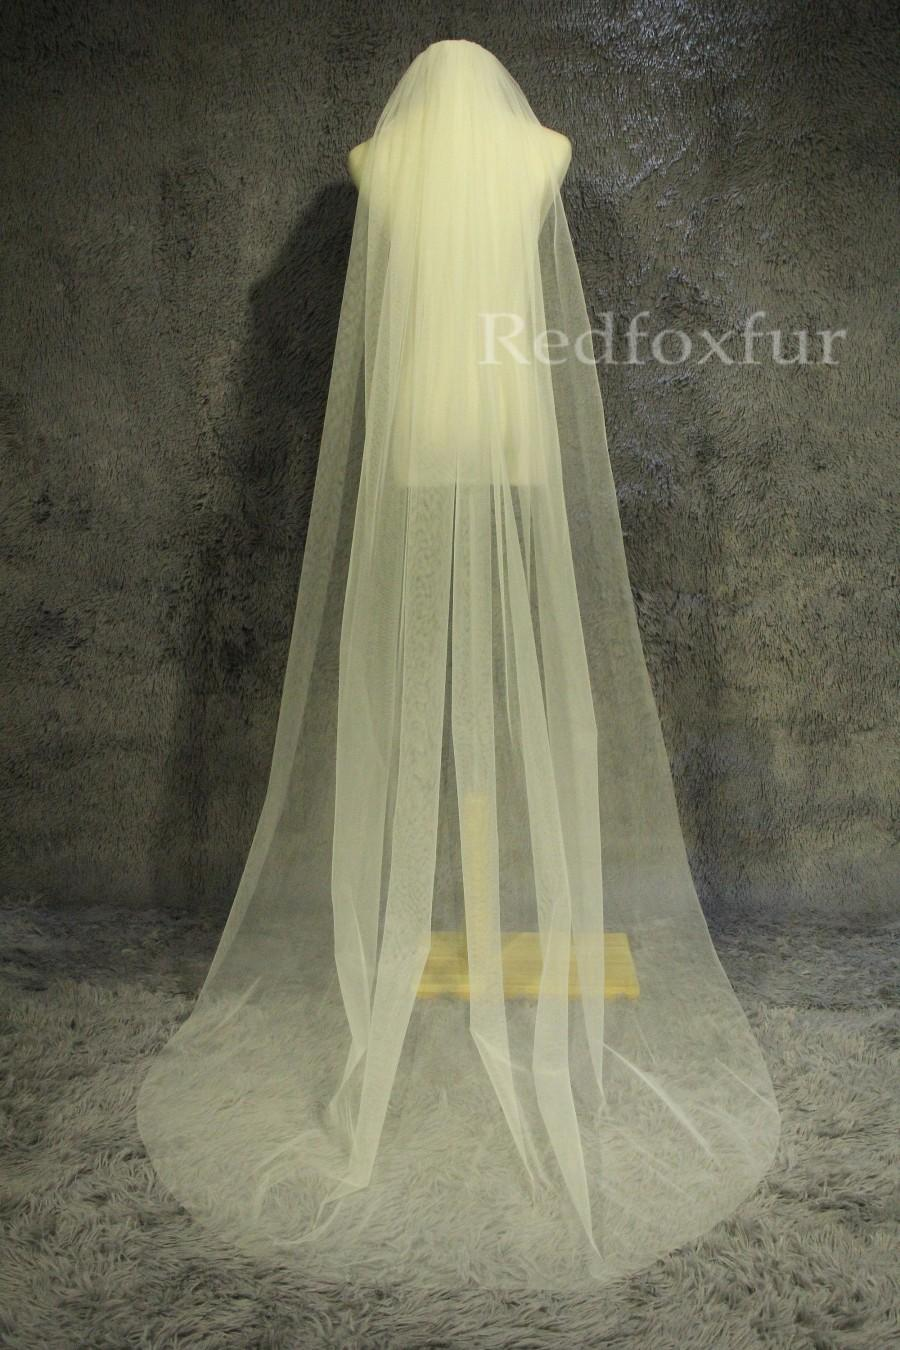 Hochzeit - Custom veil,Minimalist design veil,Soft tulle veil,1Tier cathedral veil,cut edge veil,chapel veil,Wedding Bridal veil,Accessories